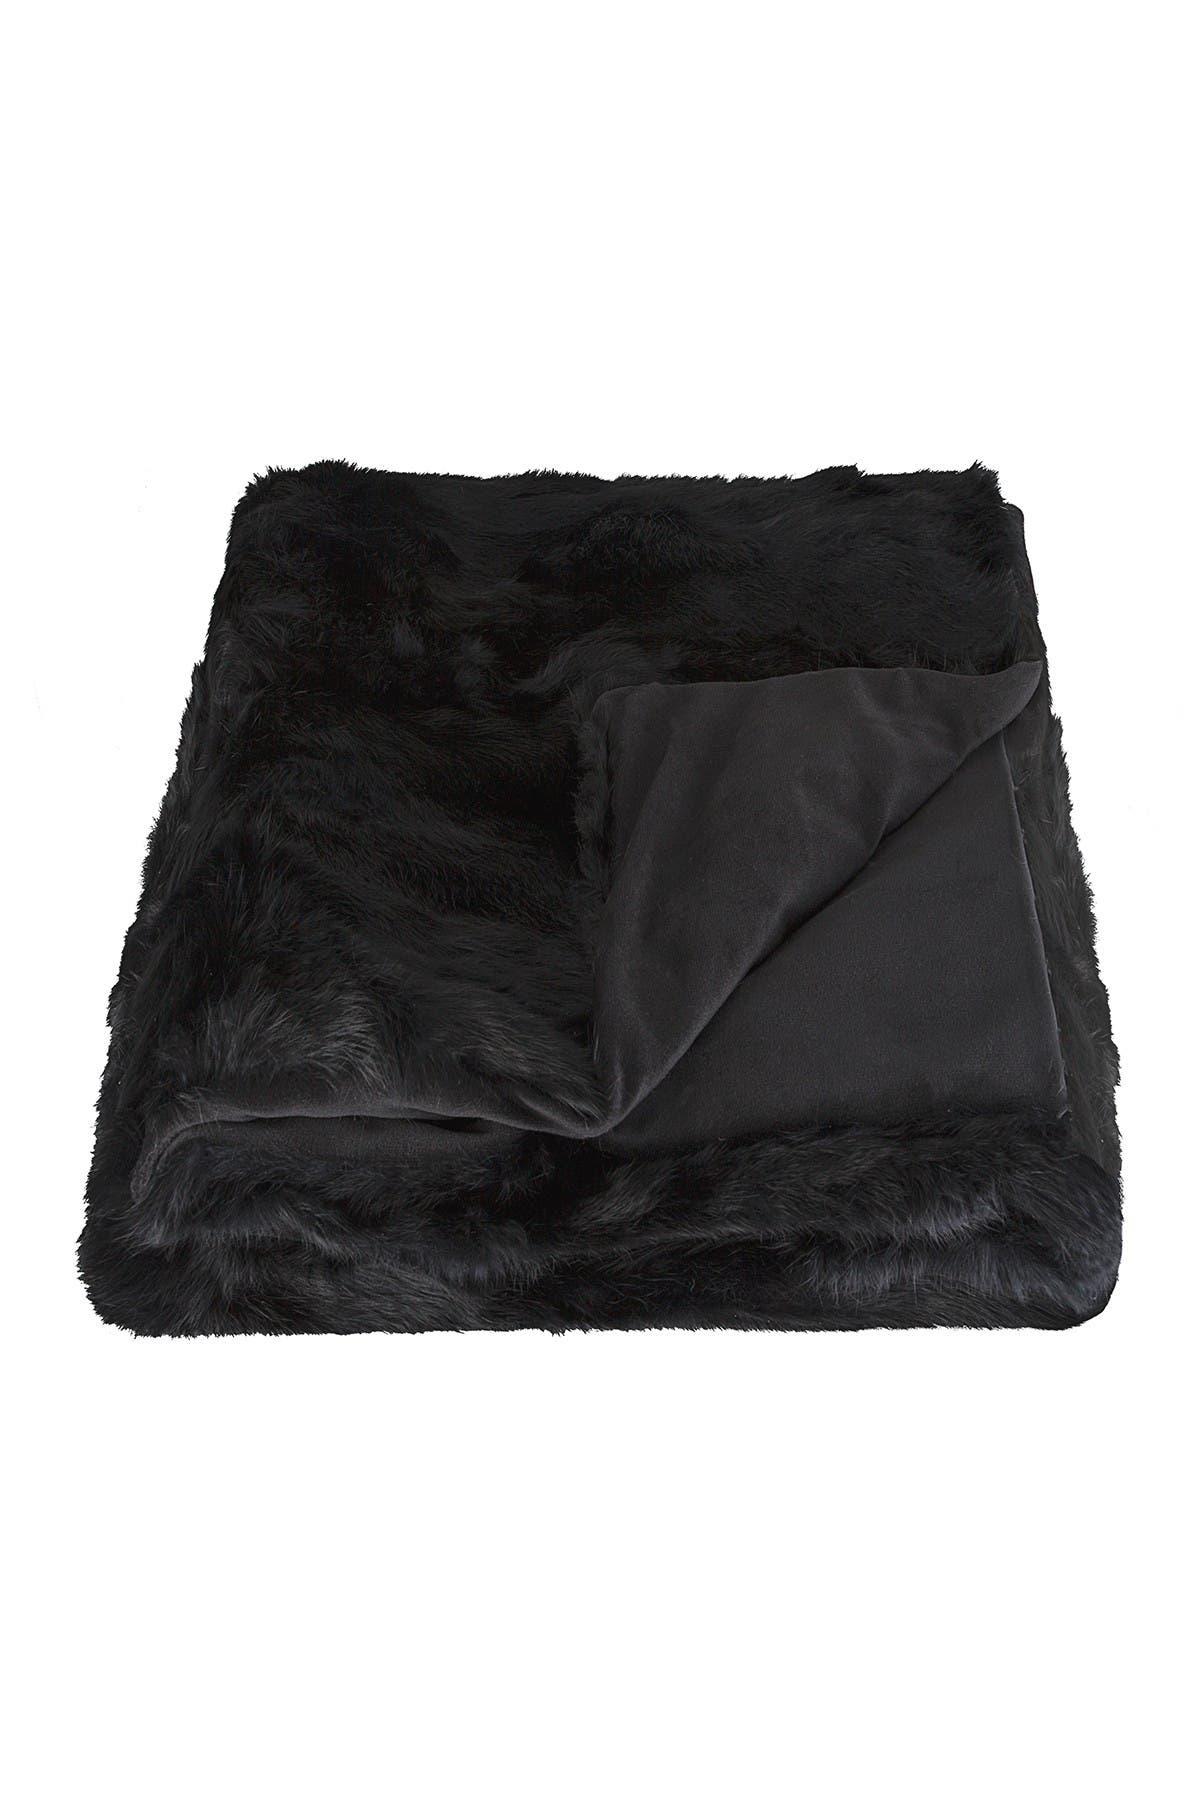 "Image of Natural Genuine Rabbit Fur Throw Blanket - 50"" x 60"" - Black"